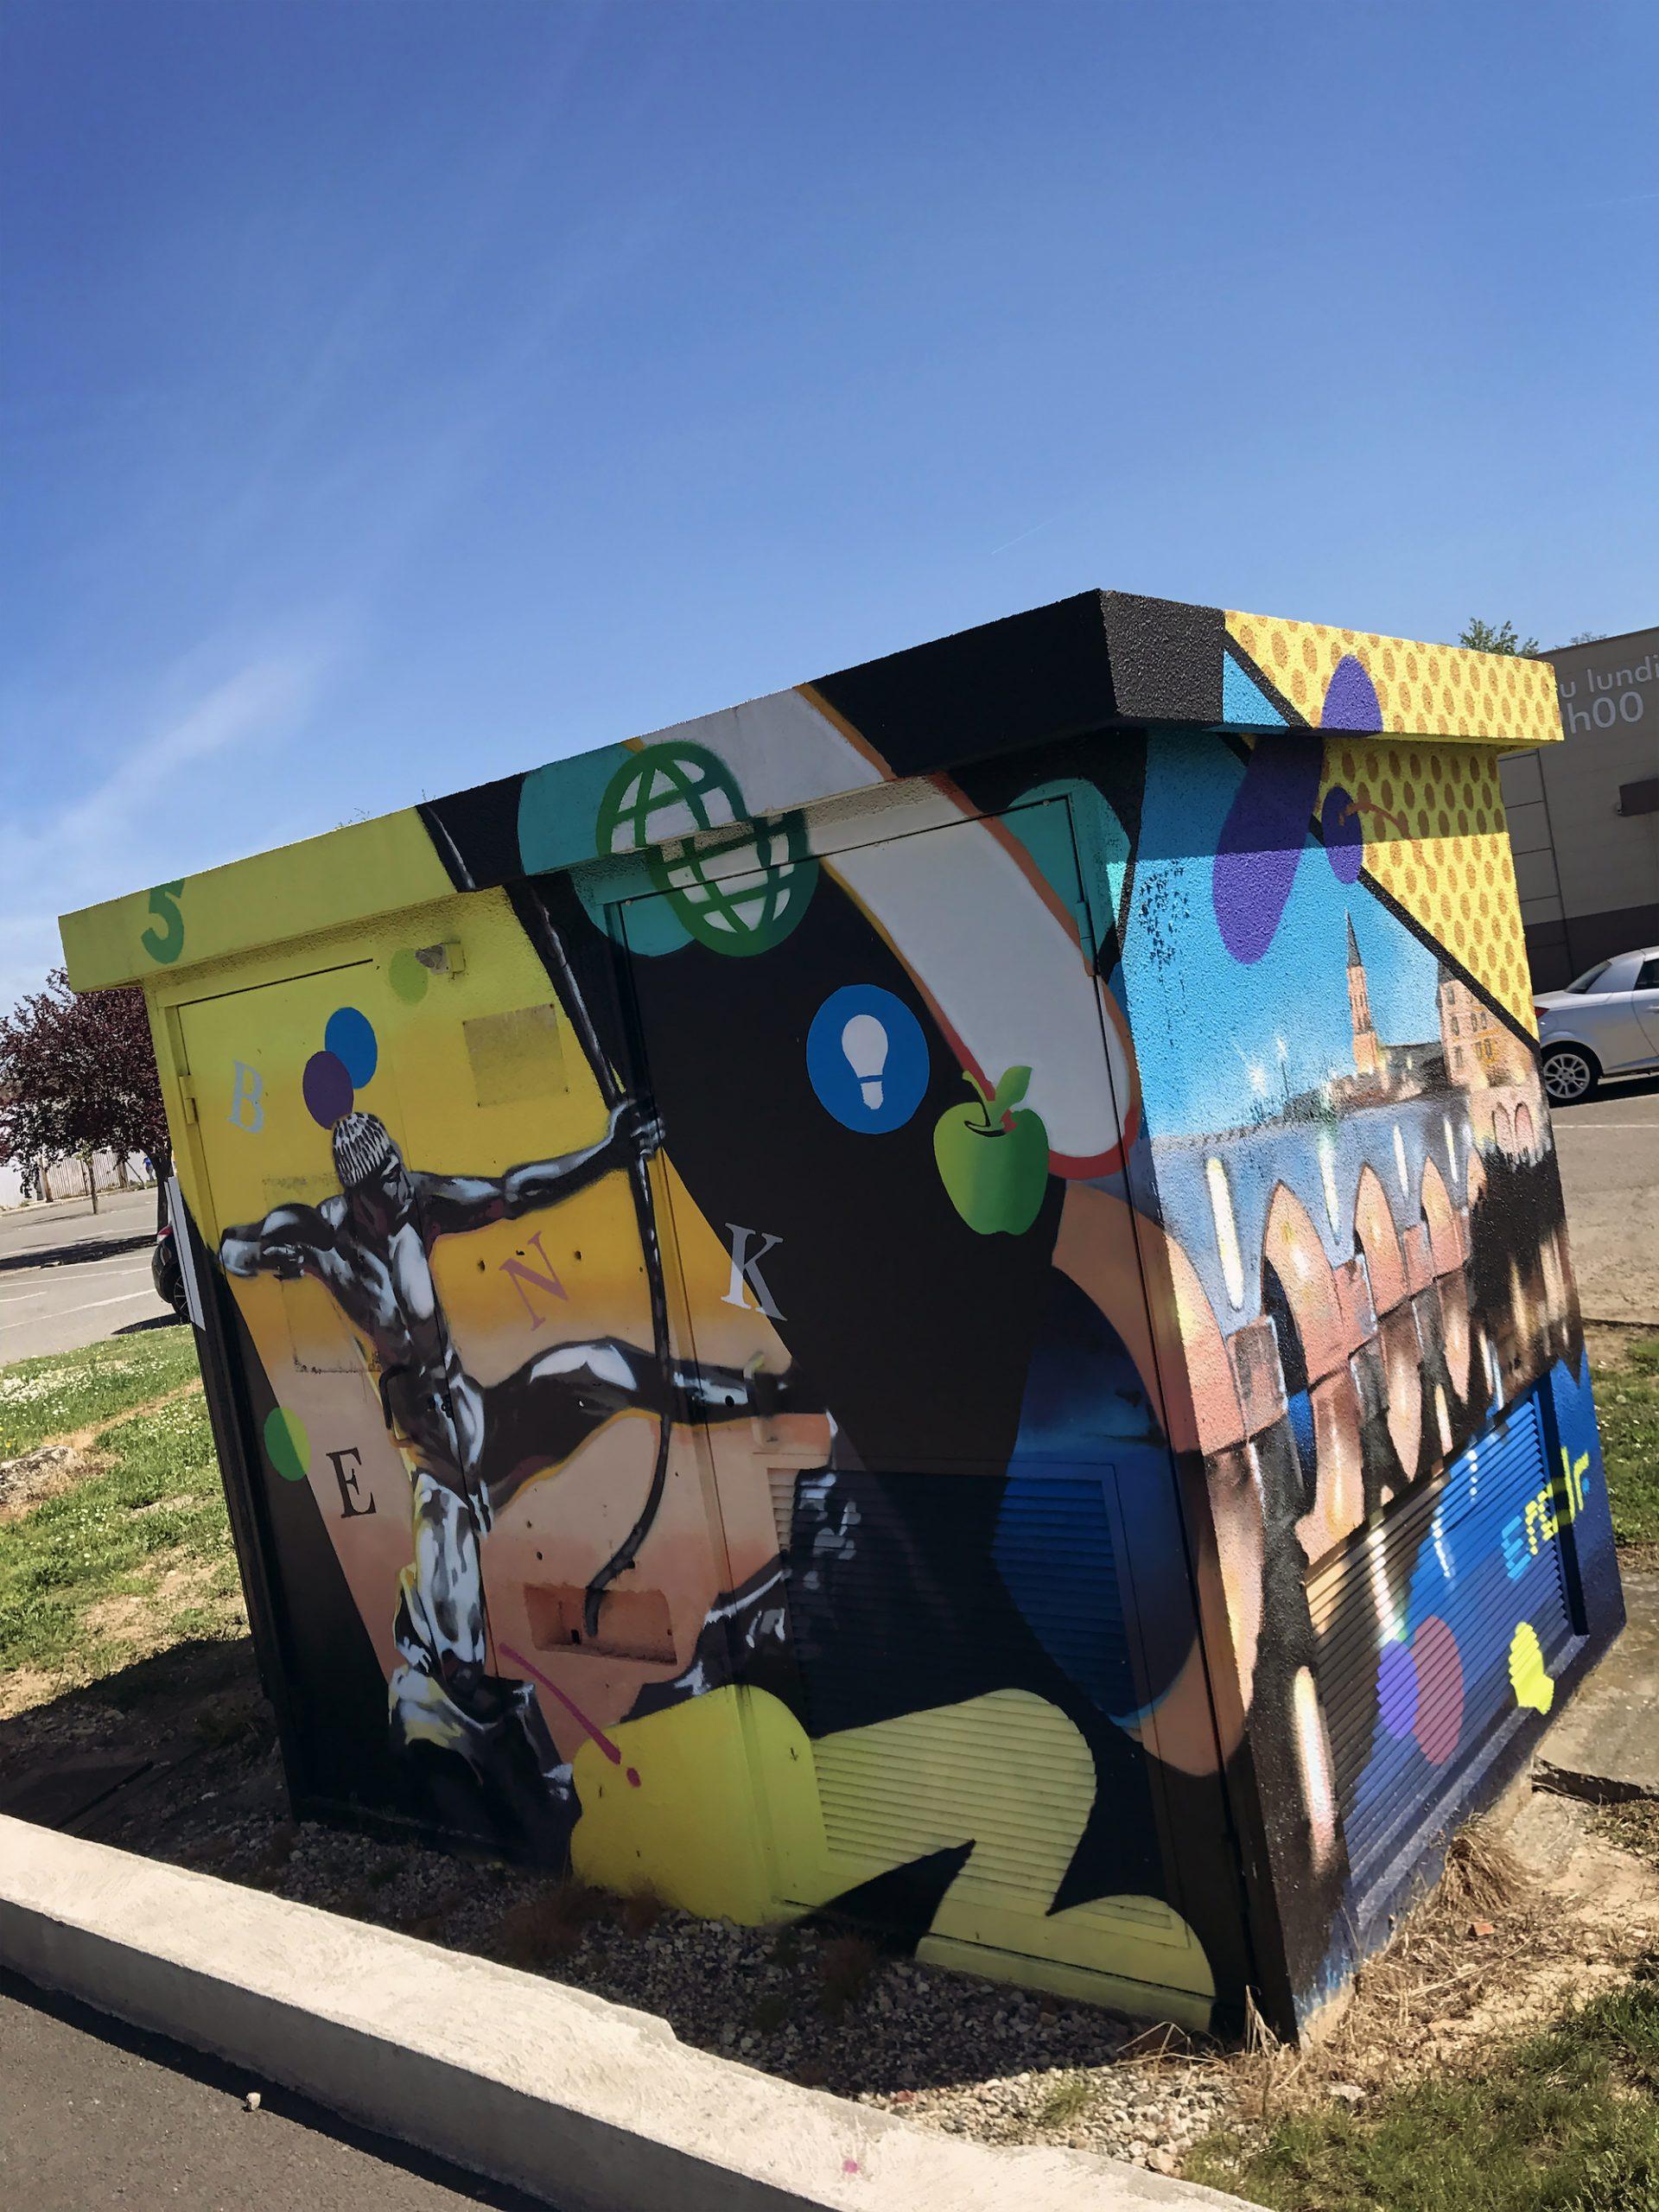 montauban-enedis-poste-transformation-graffiti-fresque-arturbain